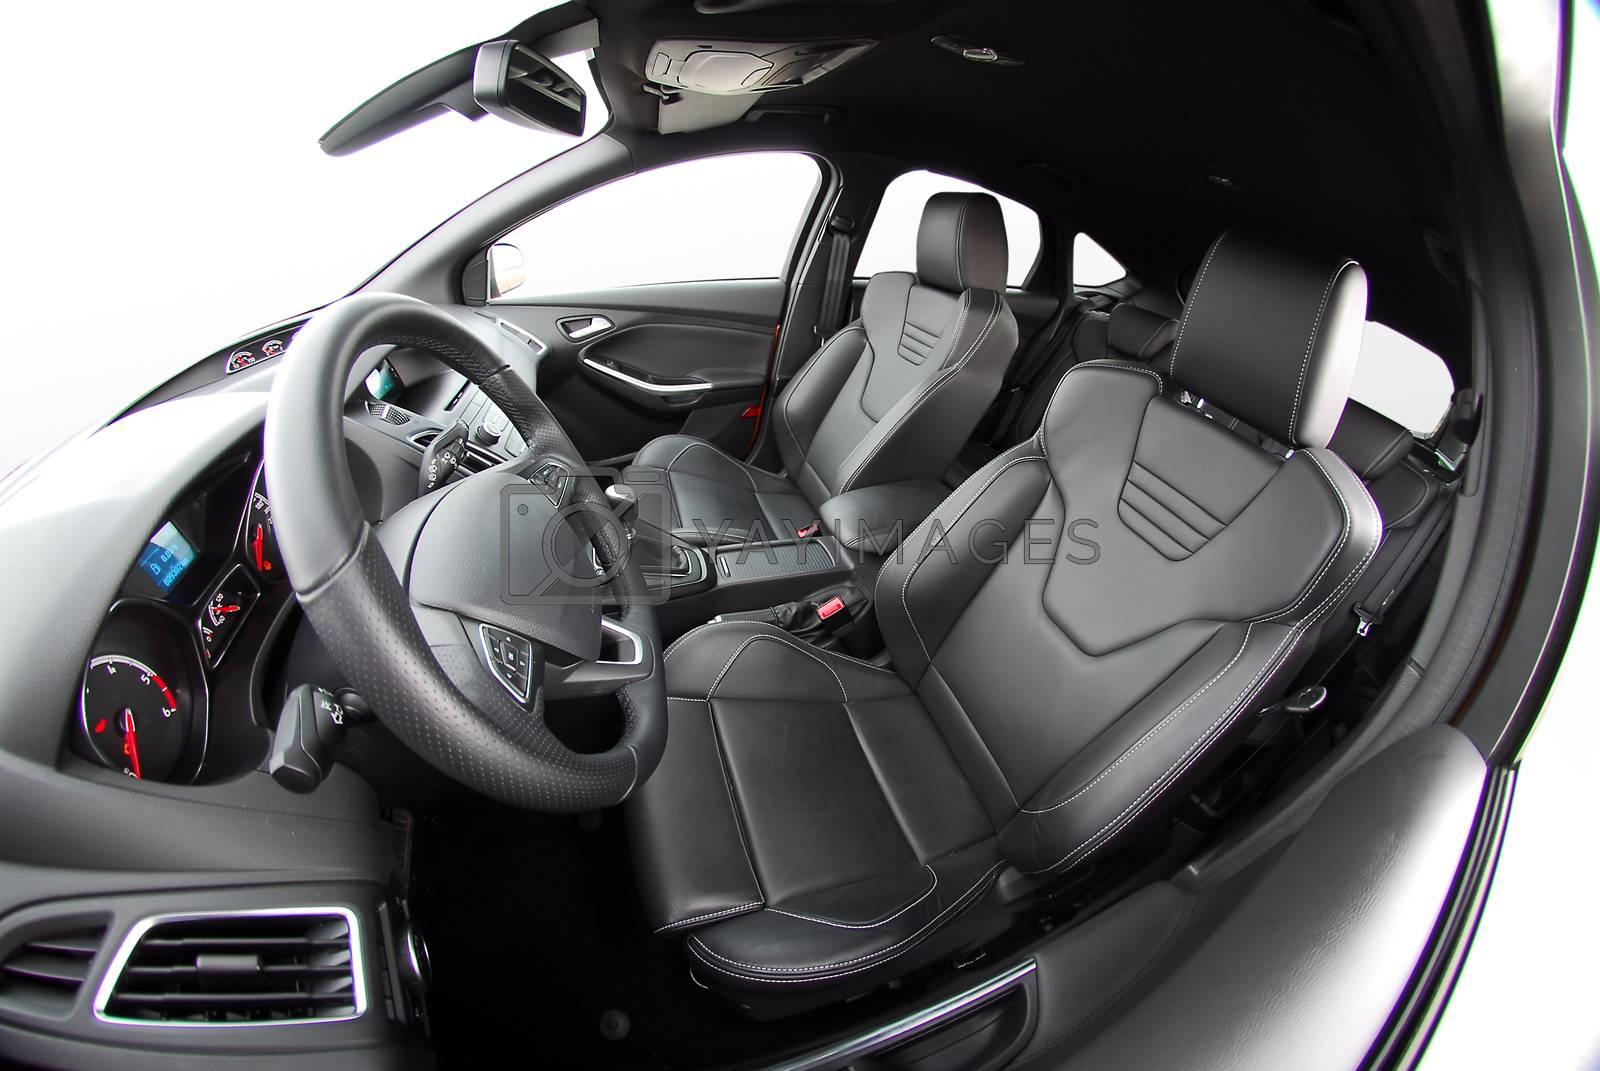 dashboard of a modern car by aselsa